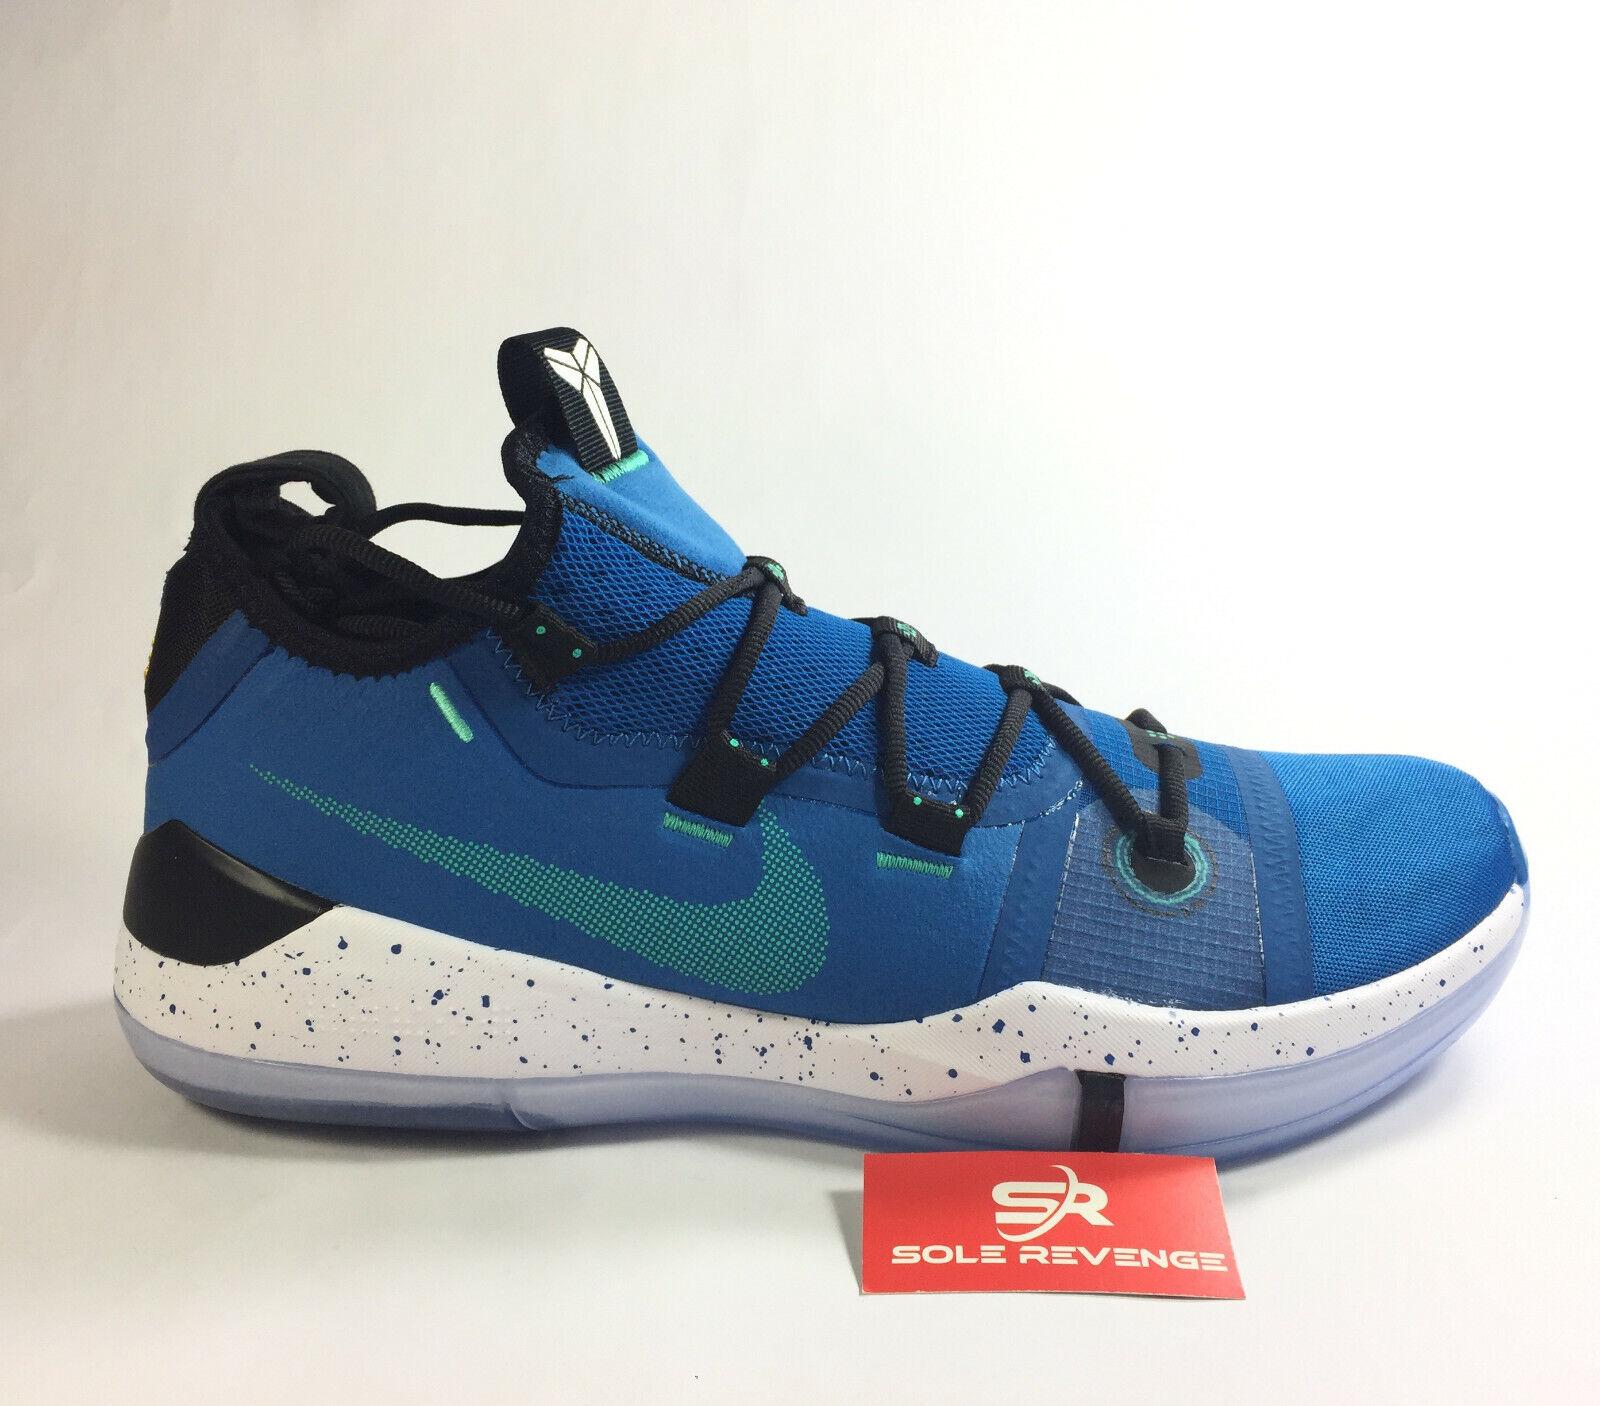 New NIKE KOBE A.D. Kobe Bryant    AV3555-400 Military bluee Sunbluesh shoes AD c1